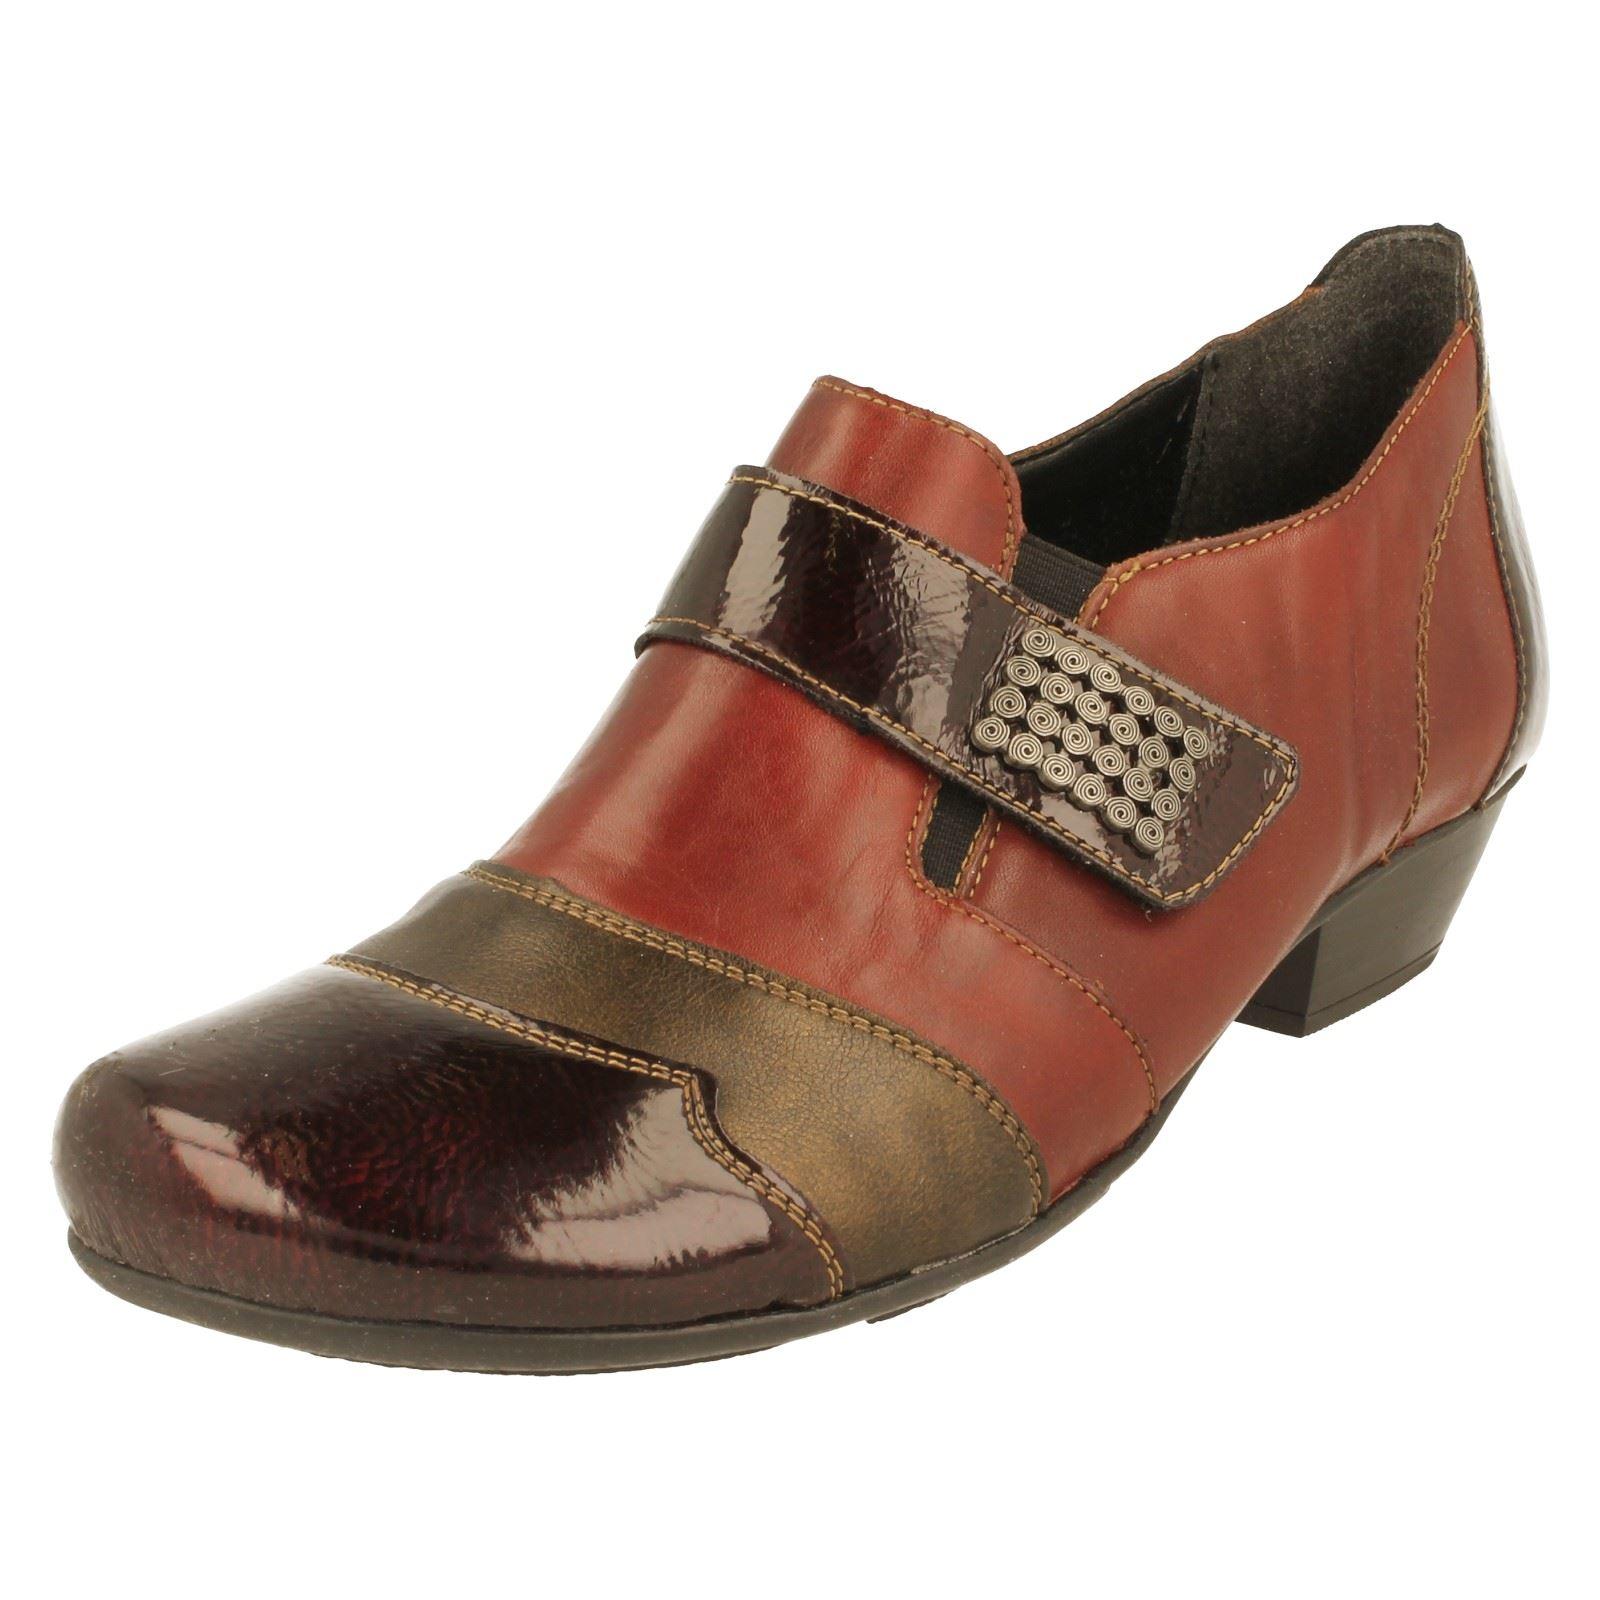 ladies remonte shoes style d7333 w ebay. Black Bedroom Furniture Sets. Home Design Ideas